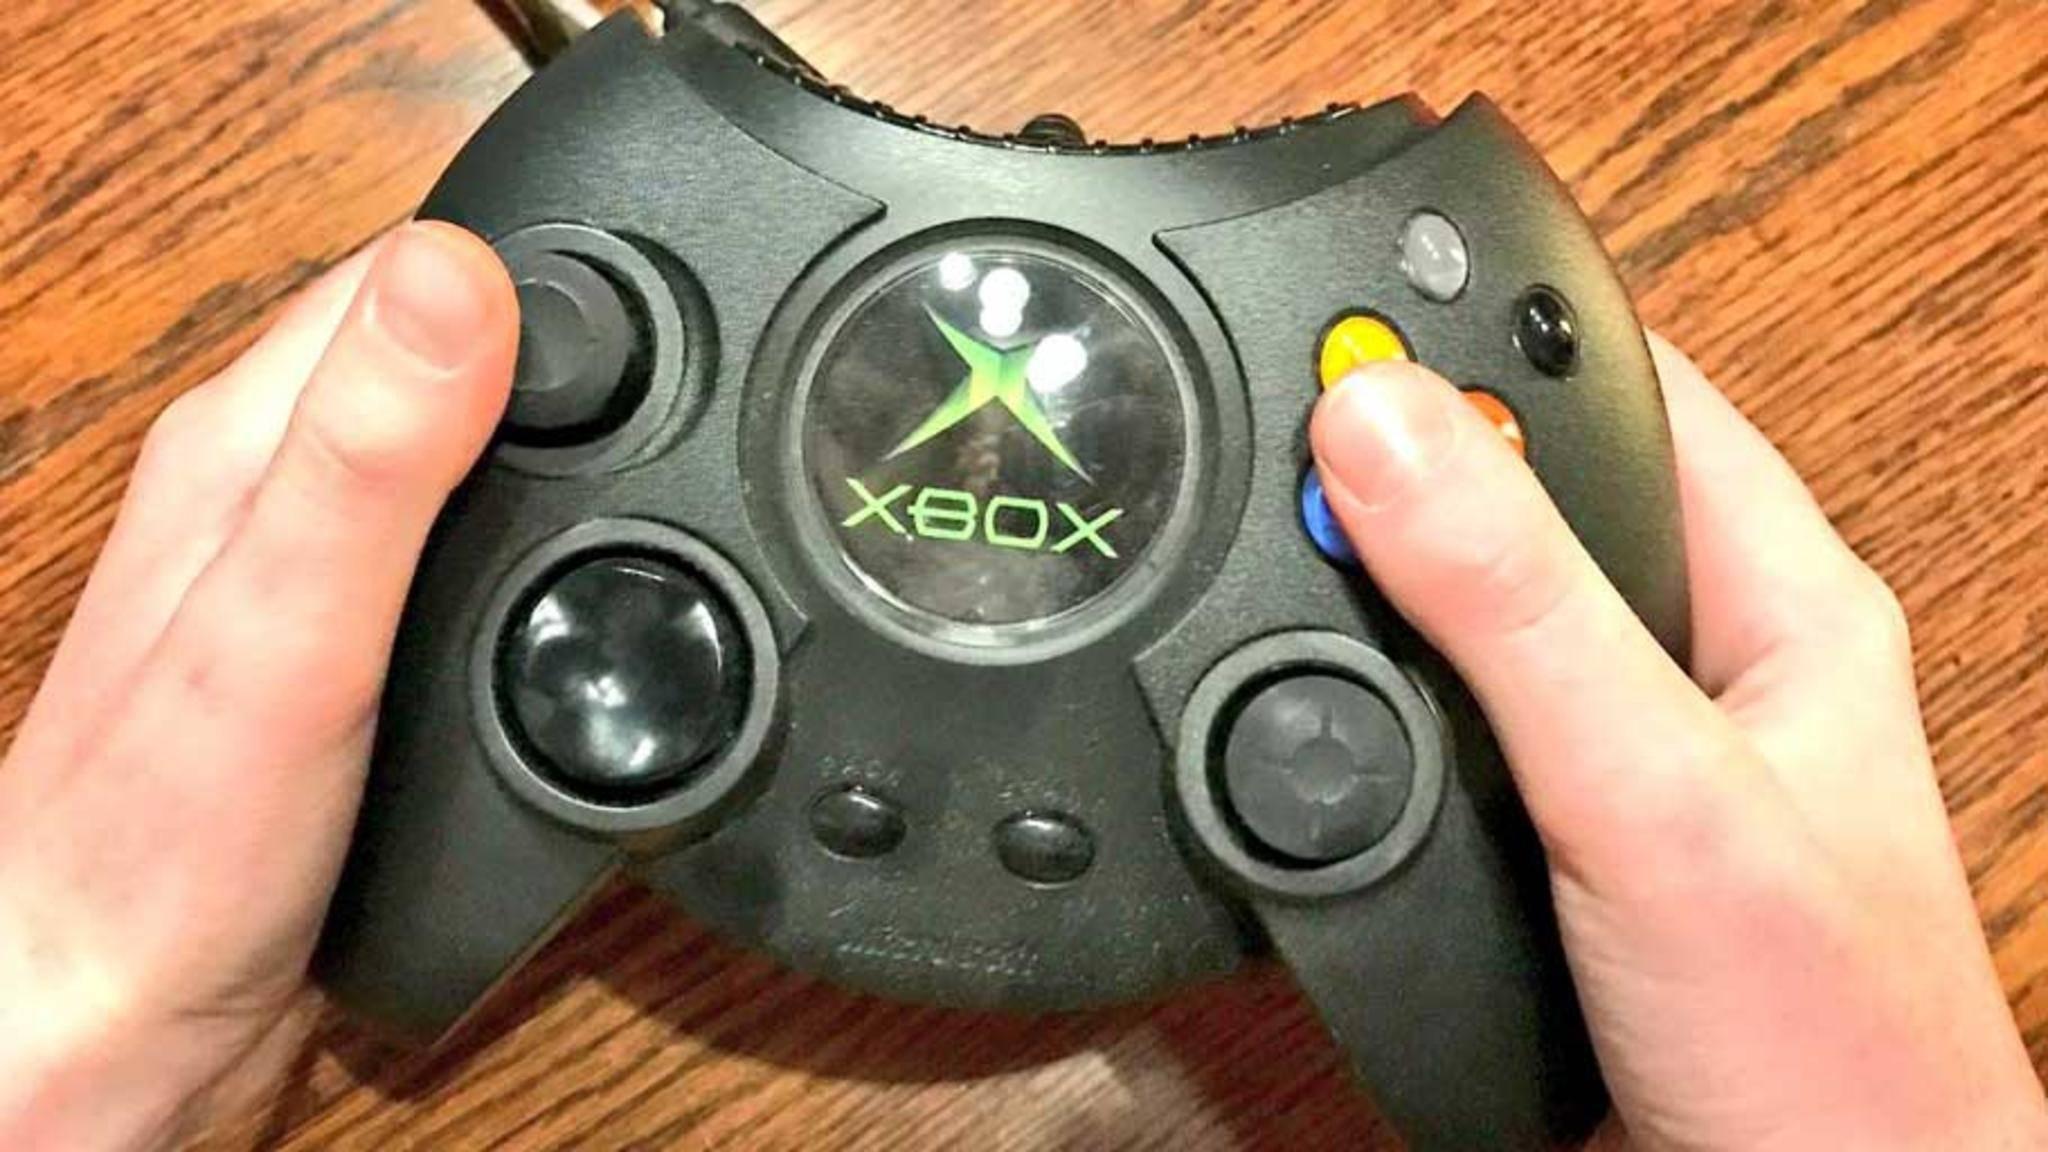 Xbox-Controller: The Duke kommt Ende März 2018.